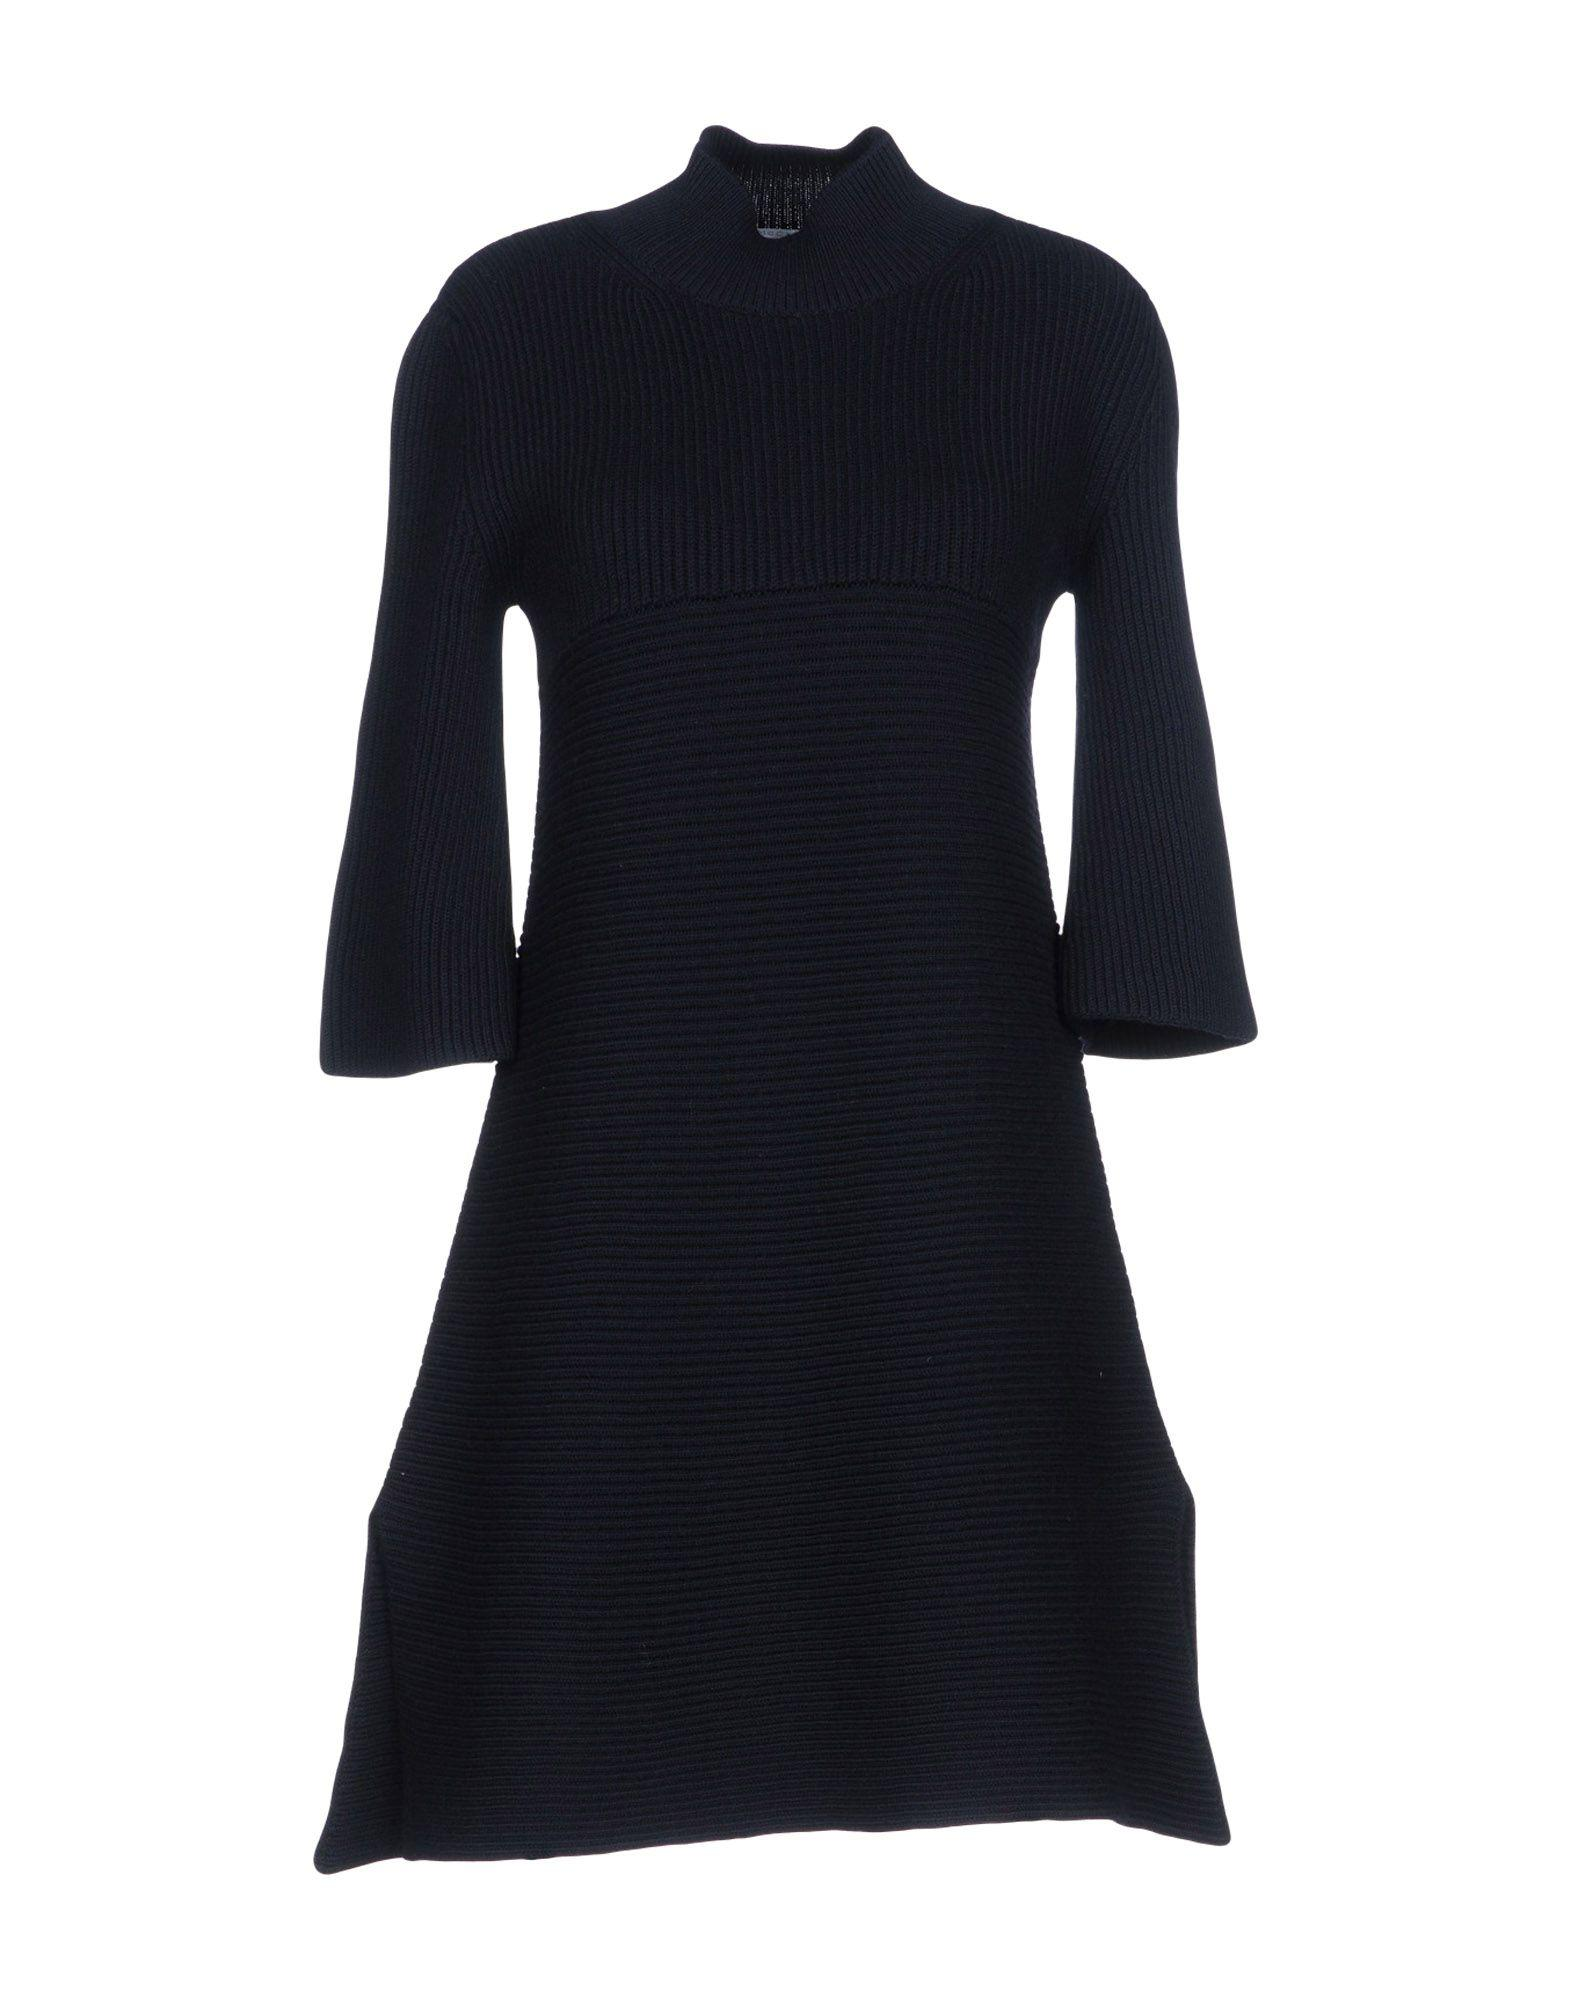 Stella Mccartney In Dark Blue